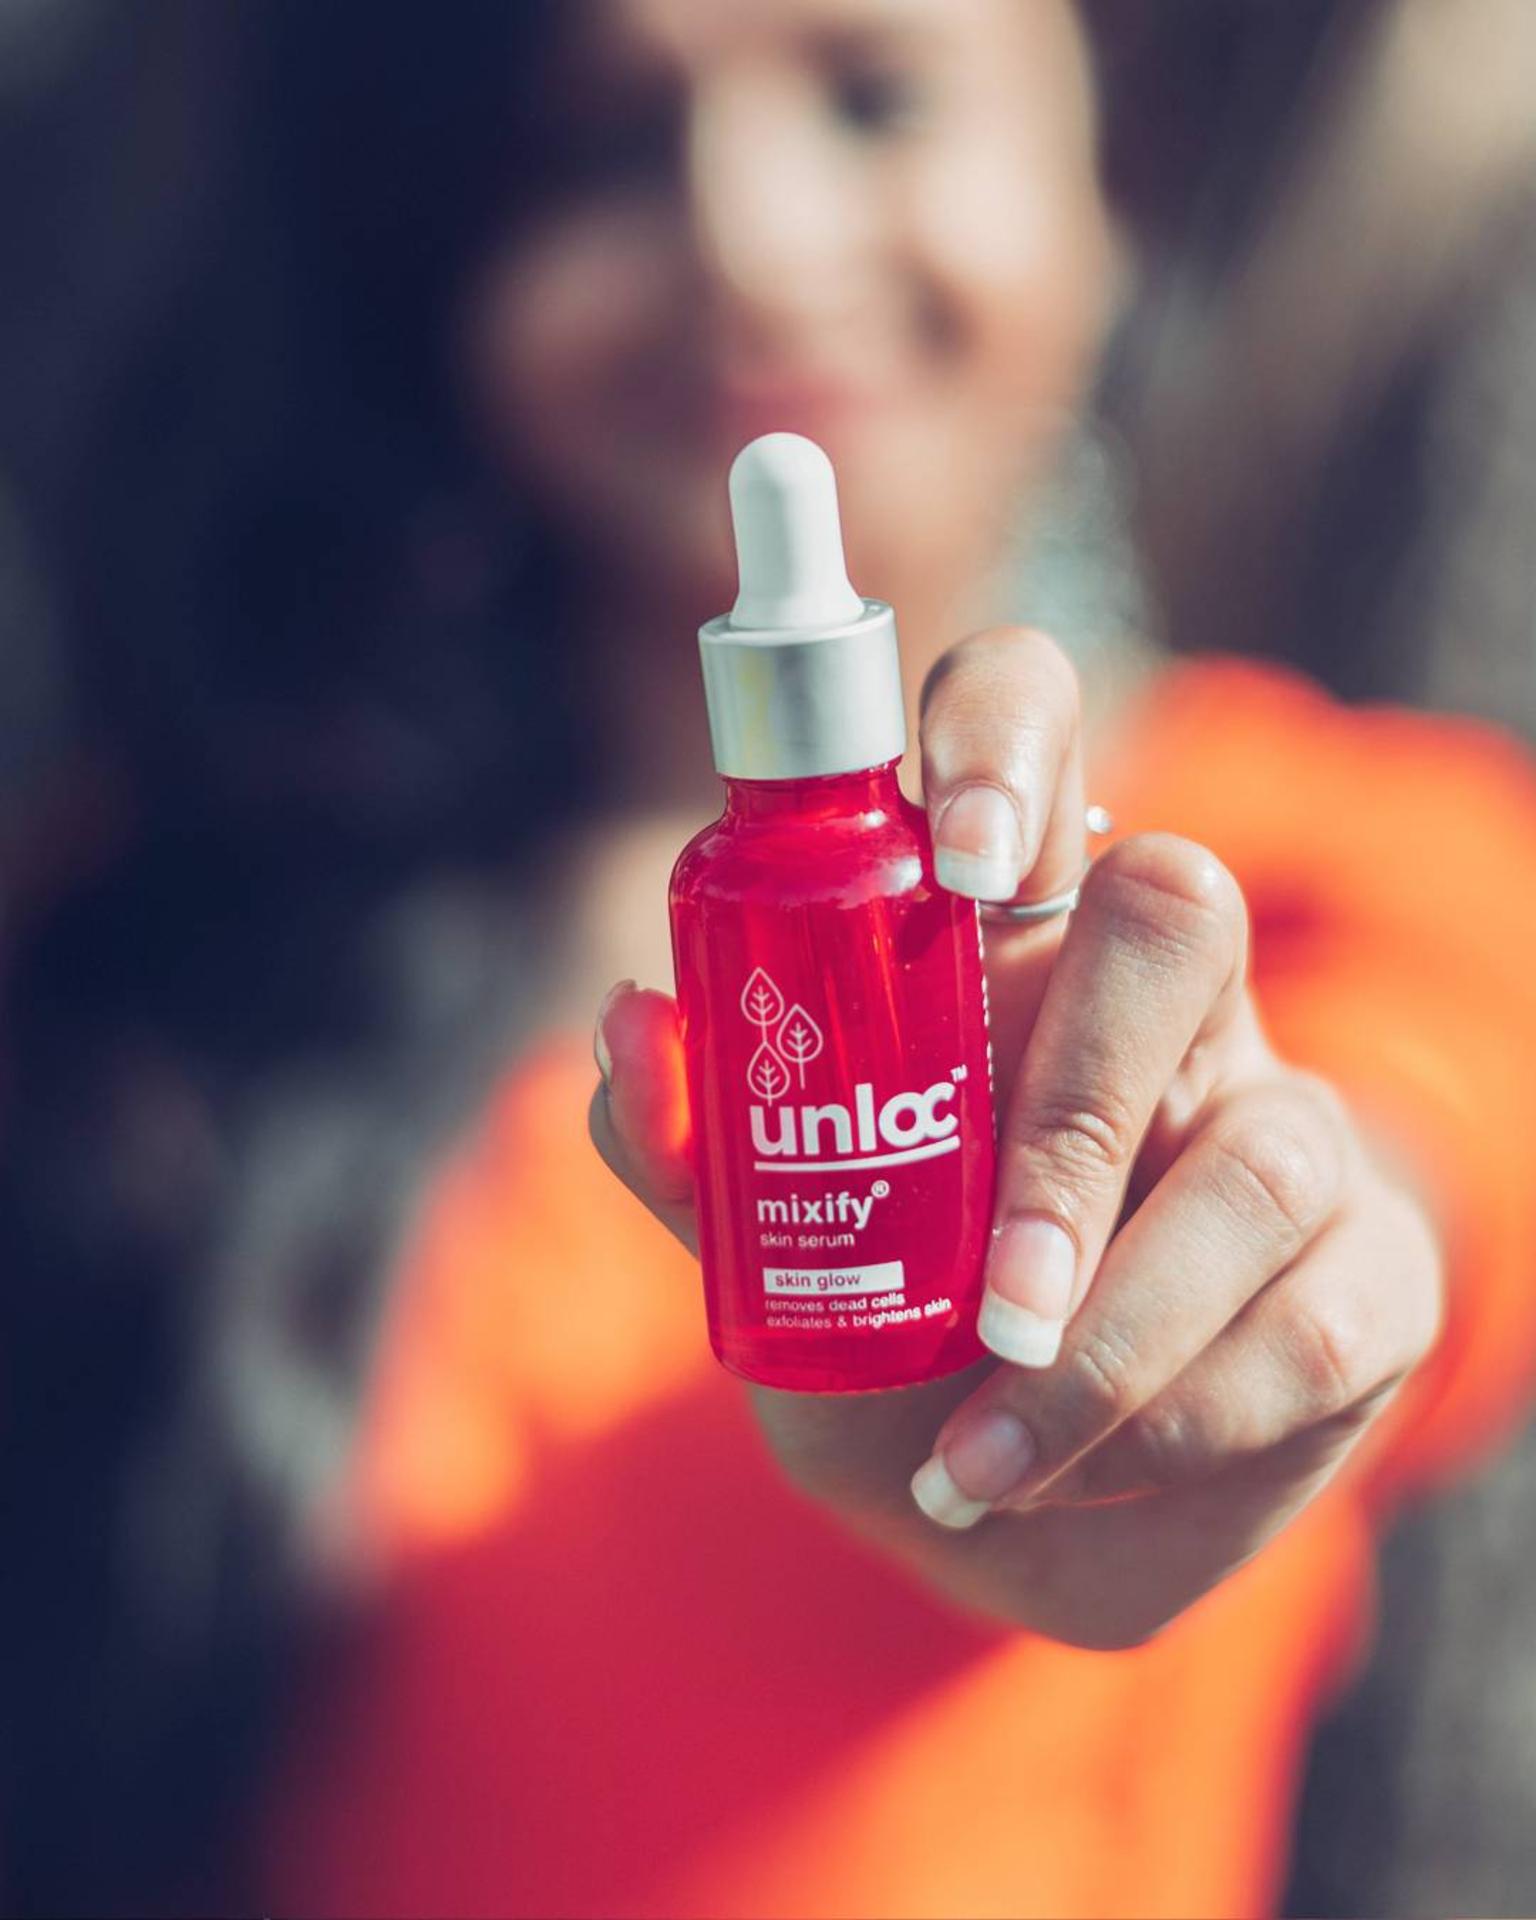 Unloc Mixify Skin Glow Serum Review  image